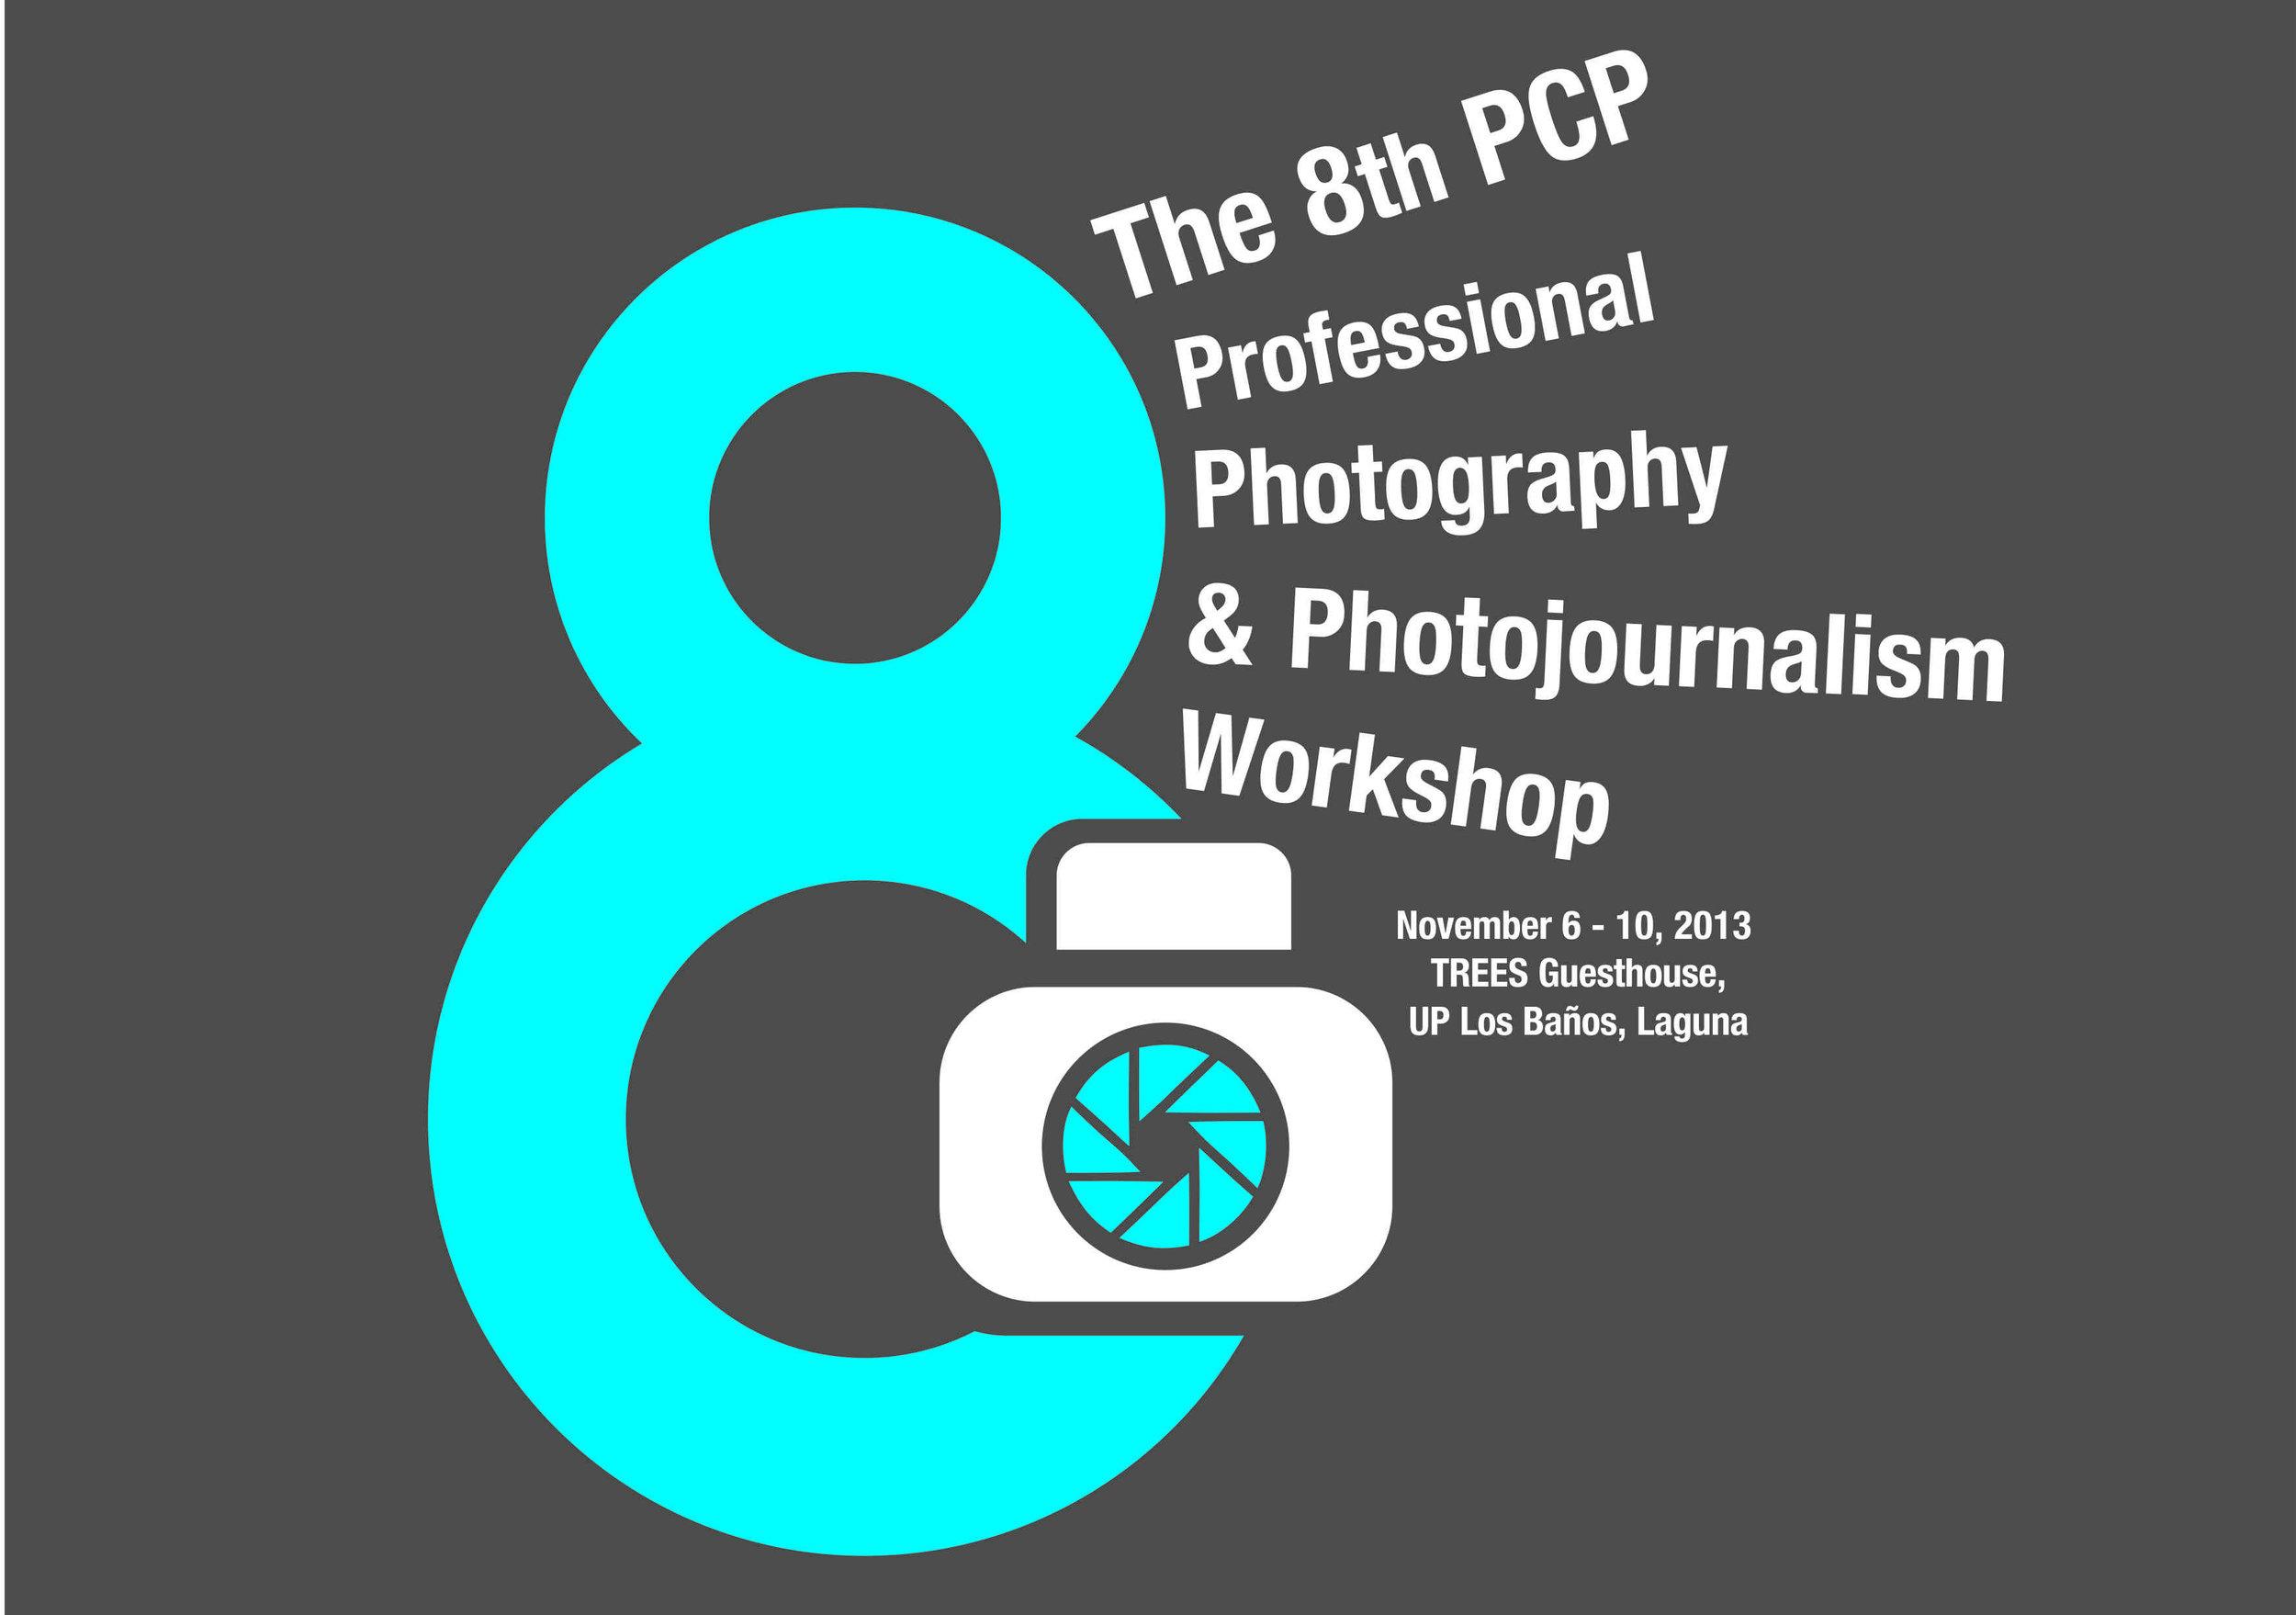 20131009_PCP_8thWorkshop_Tshirt_A4.jpg